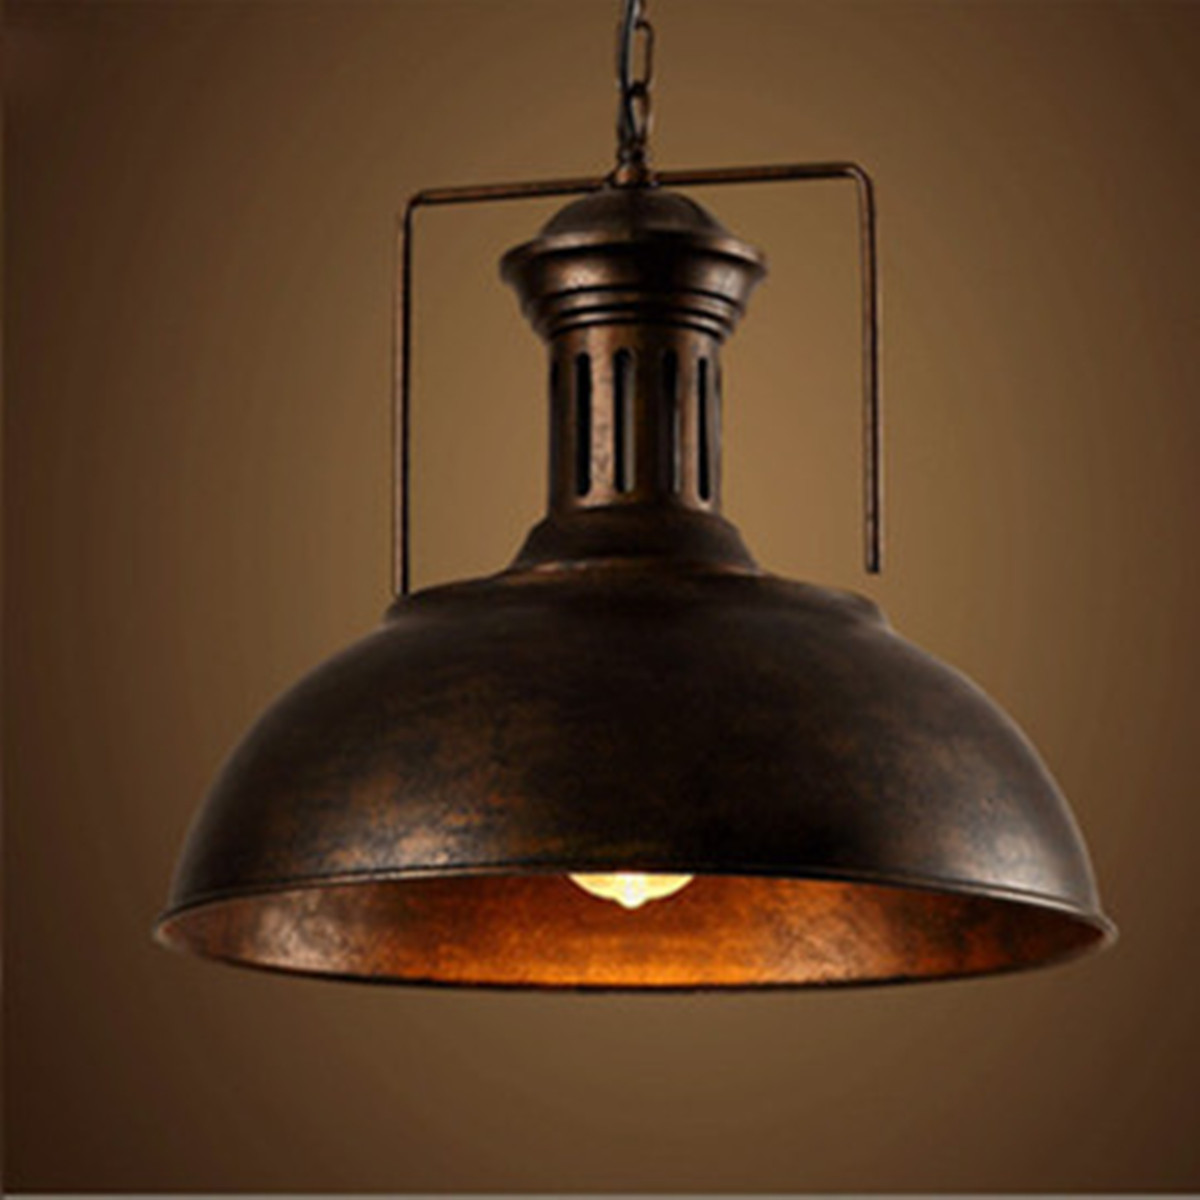 Nordic Black Rust Industrial Pendant Light Fixture E27 Holder Loft Hanging Iron Lamp shade Home Attic Suspension LuminaireNordic Black Rust Industrial Pendant Light Fixture E27 Holder Loft Hanging Iron Lamp shade Home Attic Suspension Luminaire